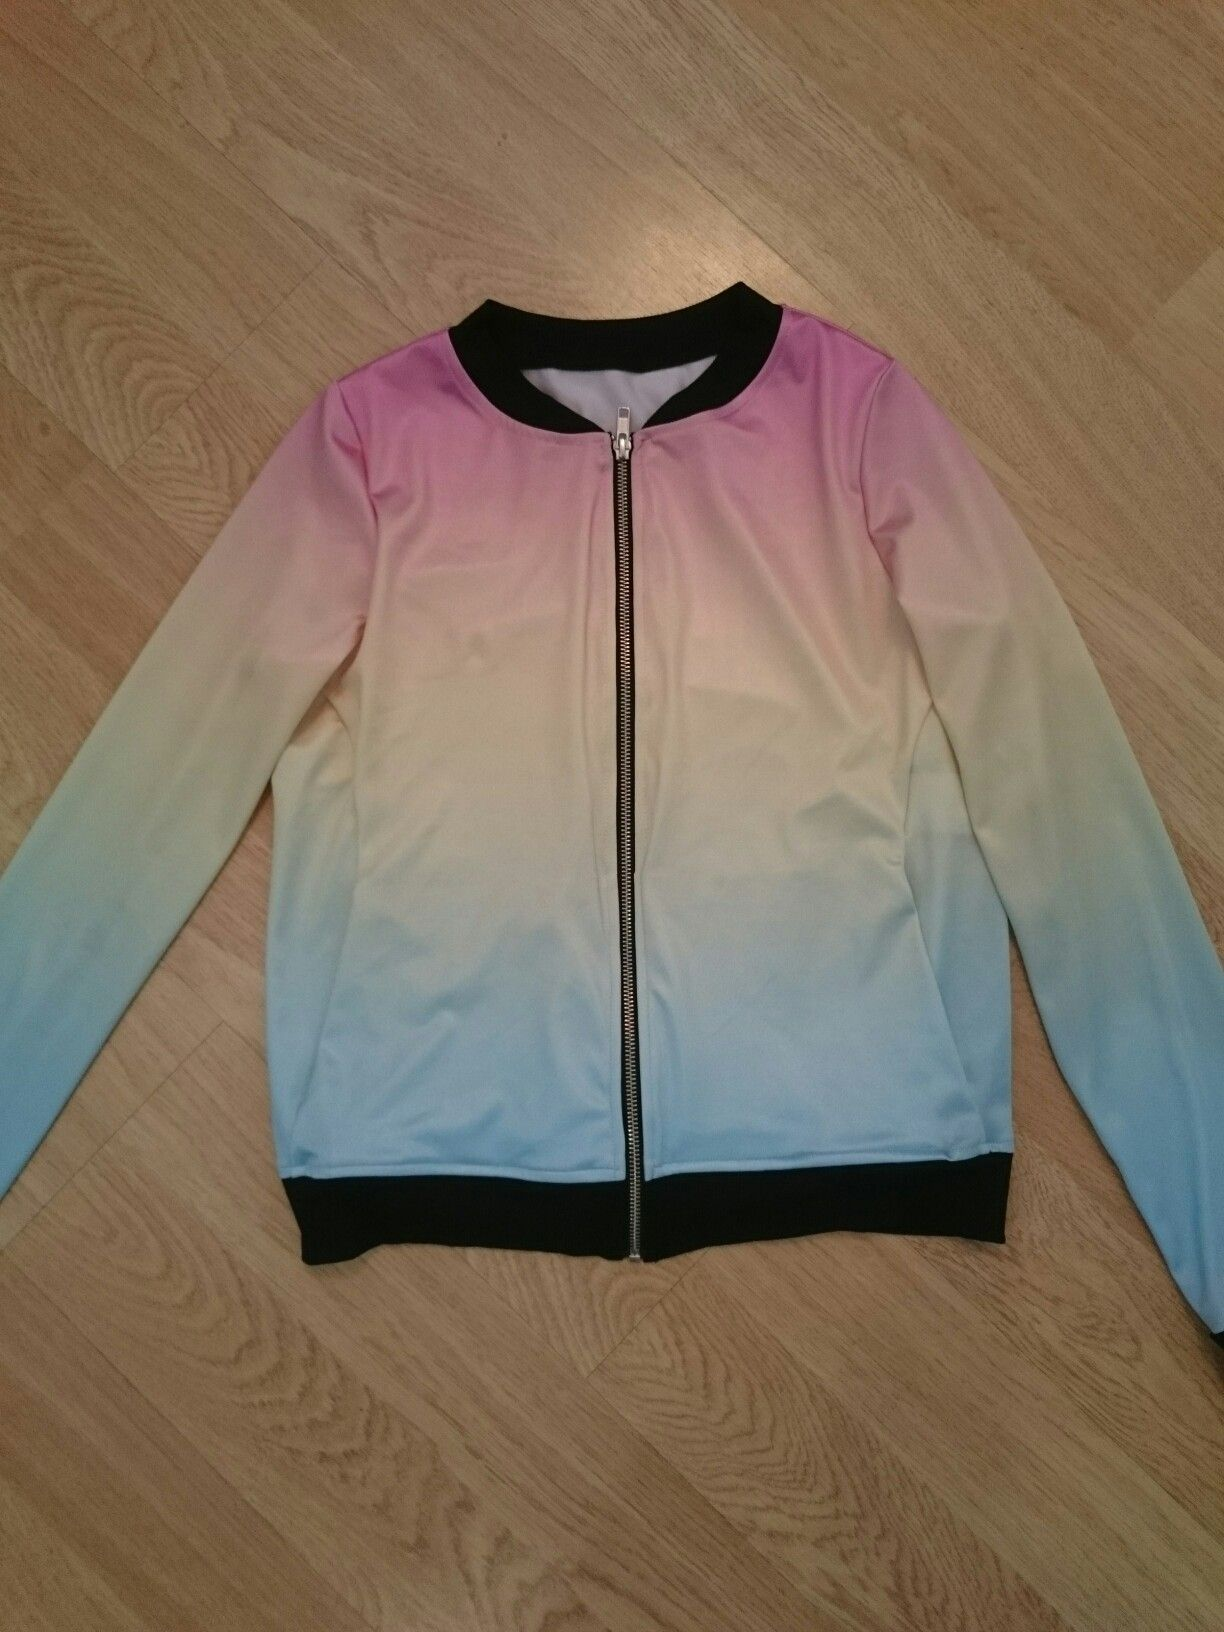 3042c9df9 Unreleased pastel rainbow bomber jacket from the Nov 16 Black Milk ...